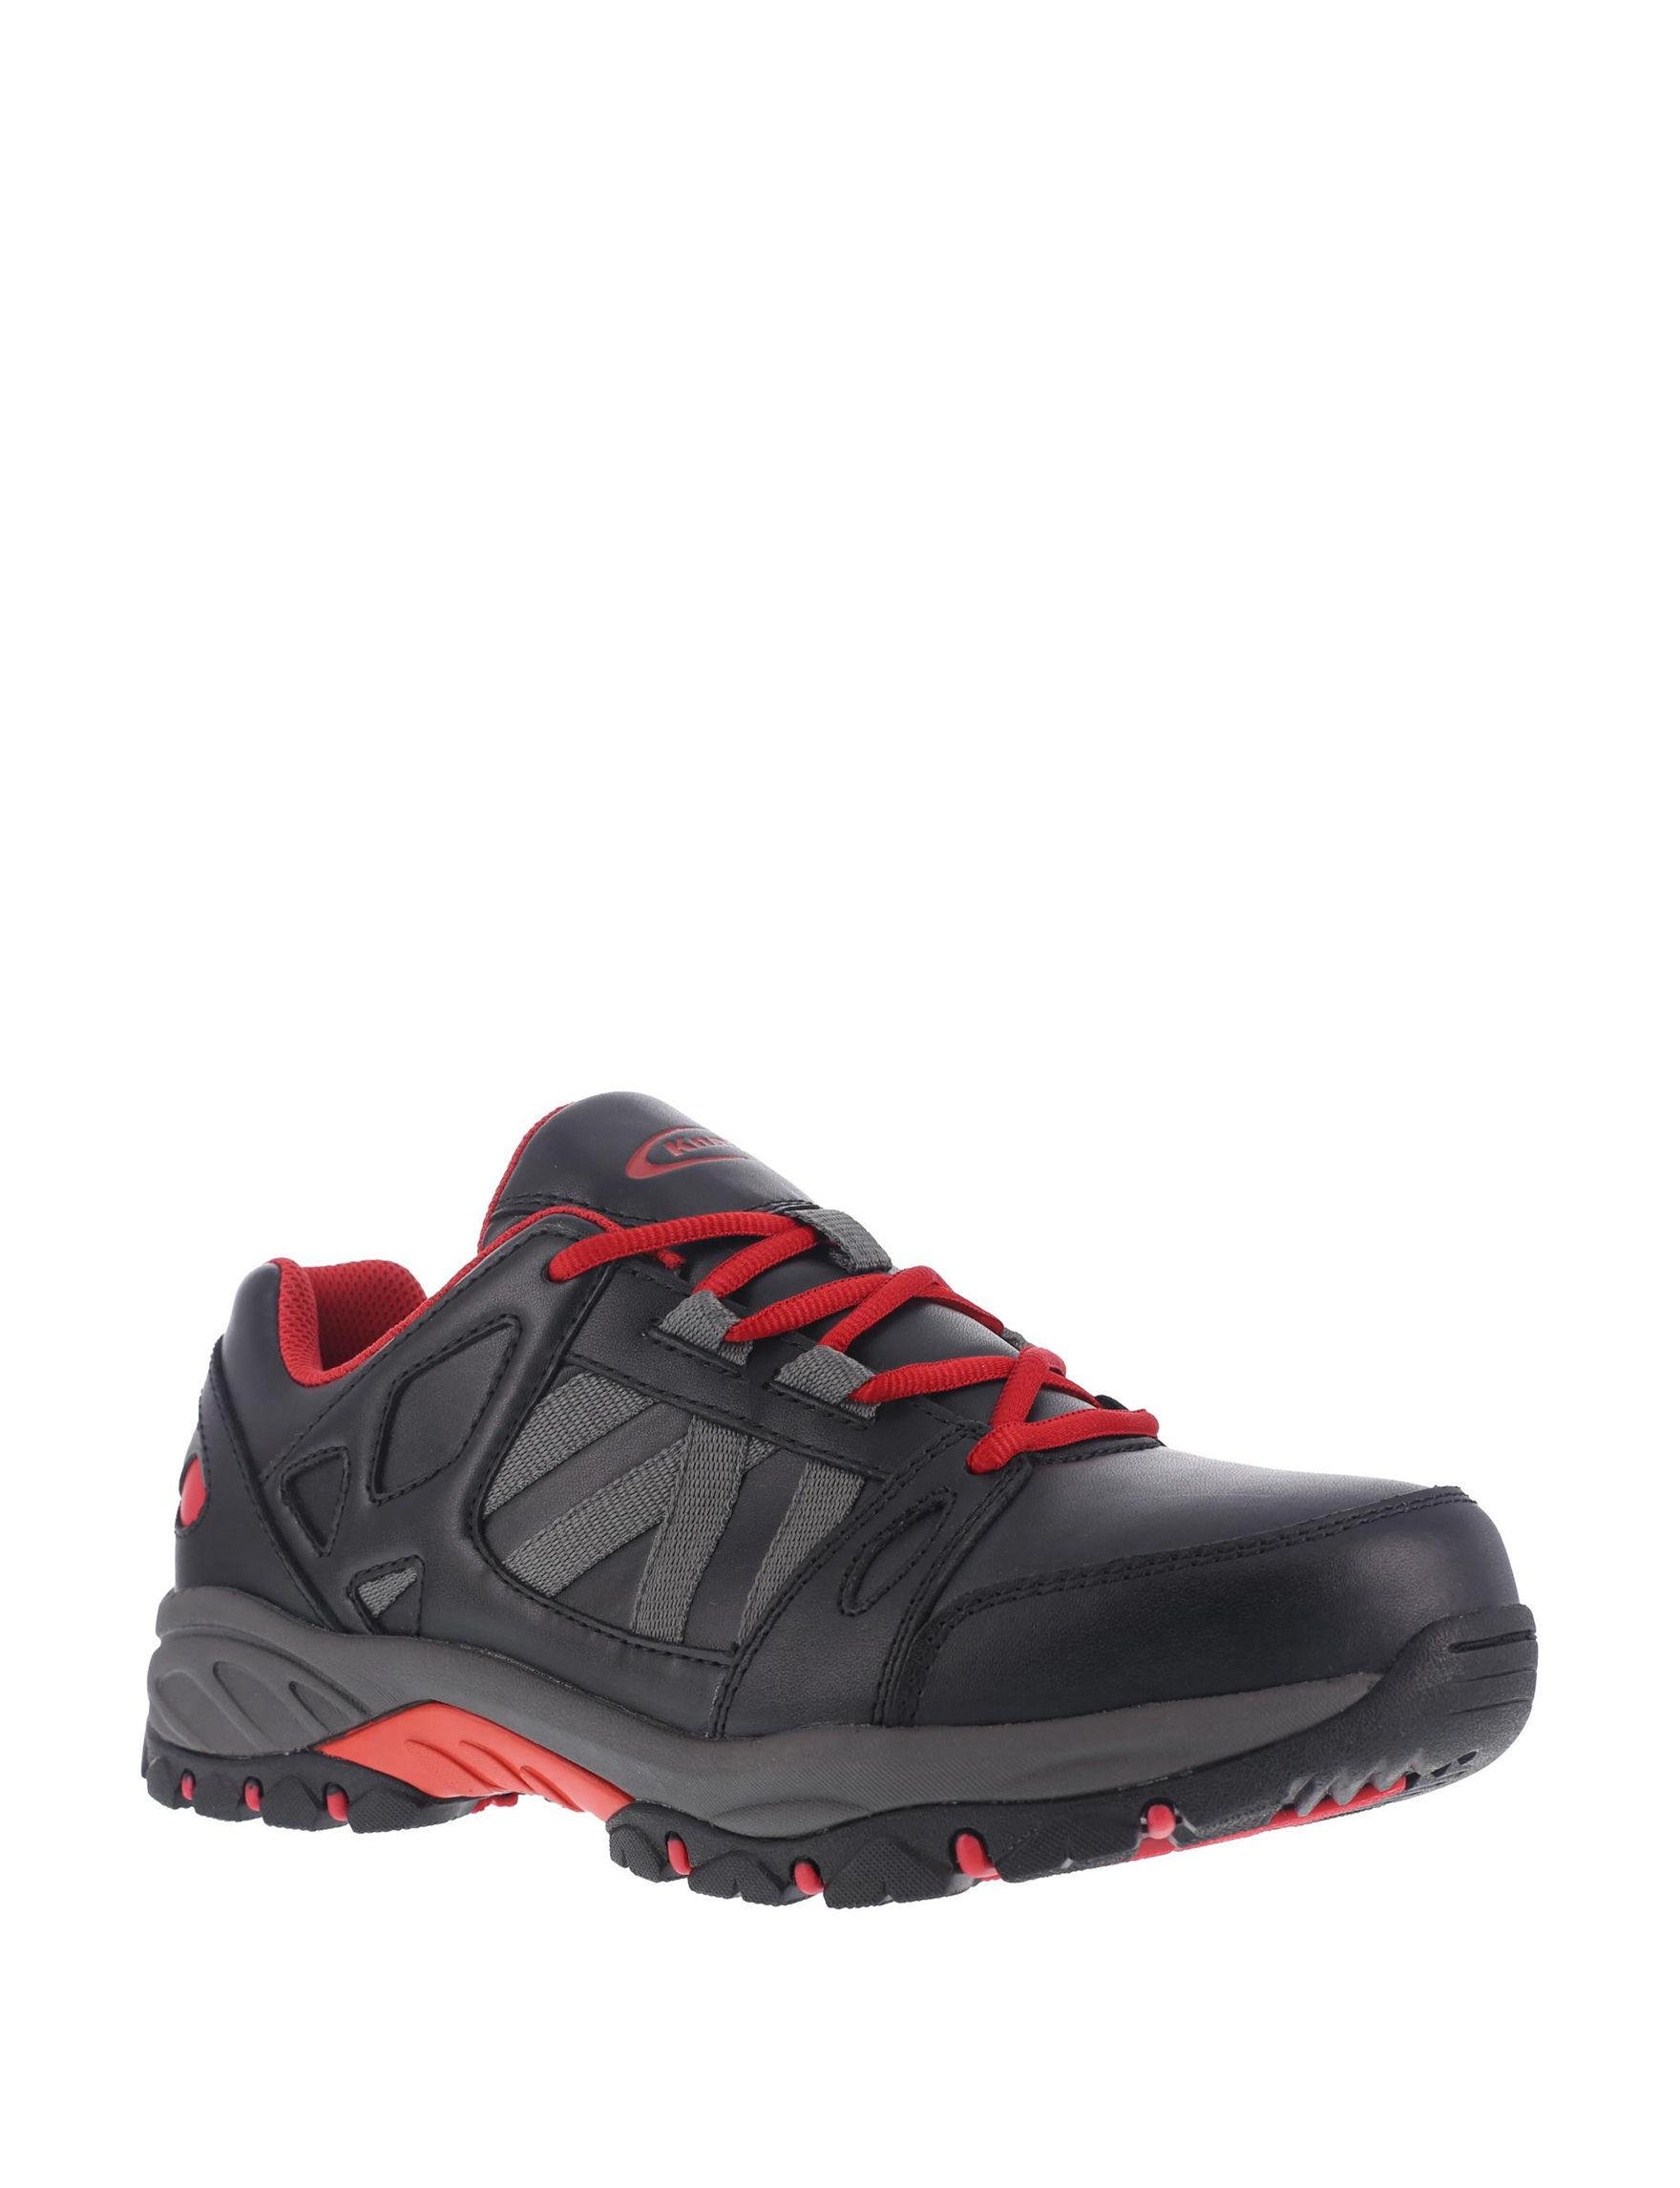 Knapp Black / Red Slip Resistant Steel Toe